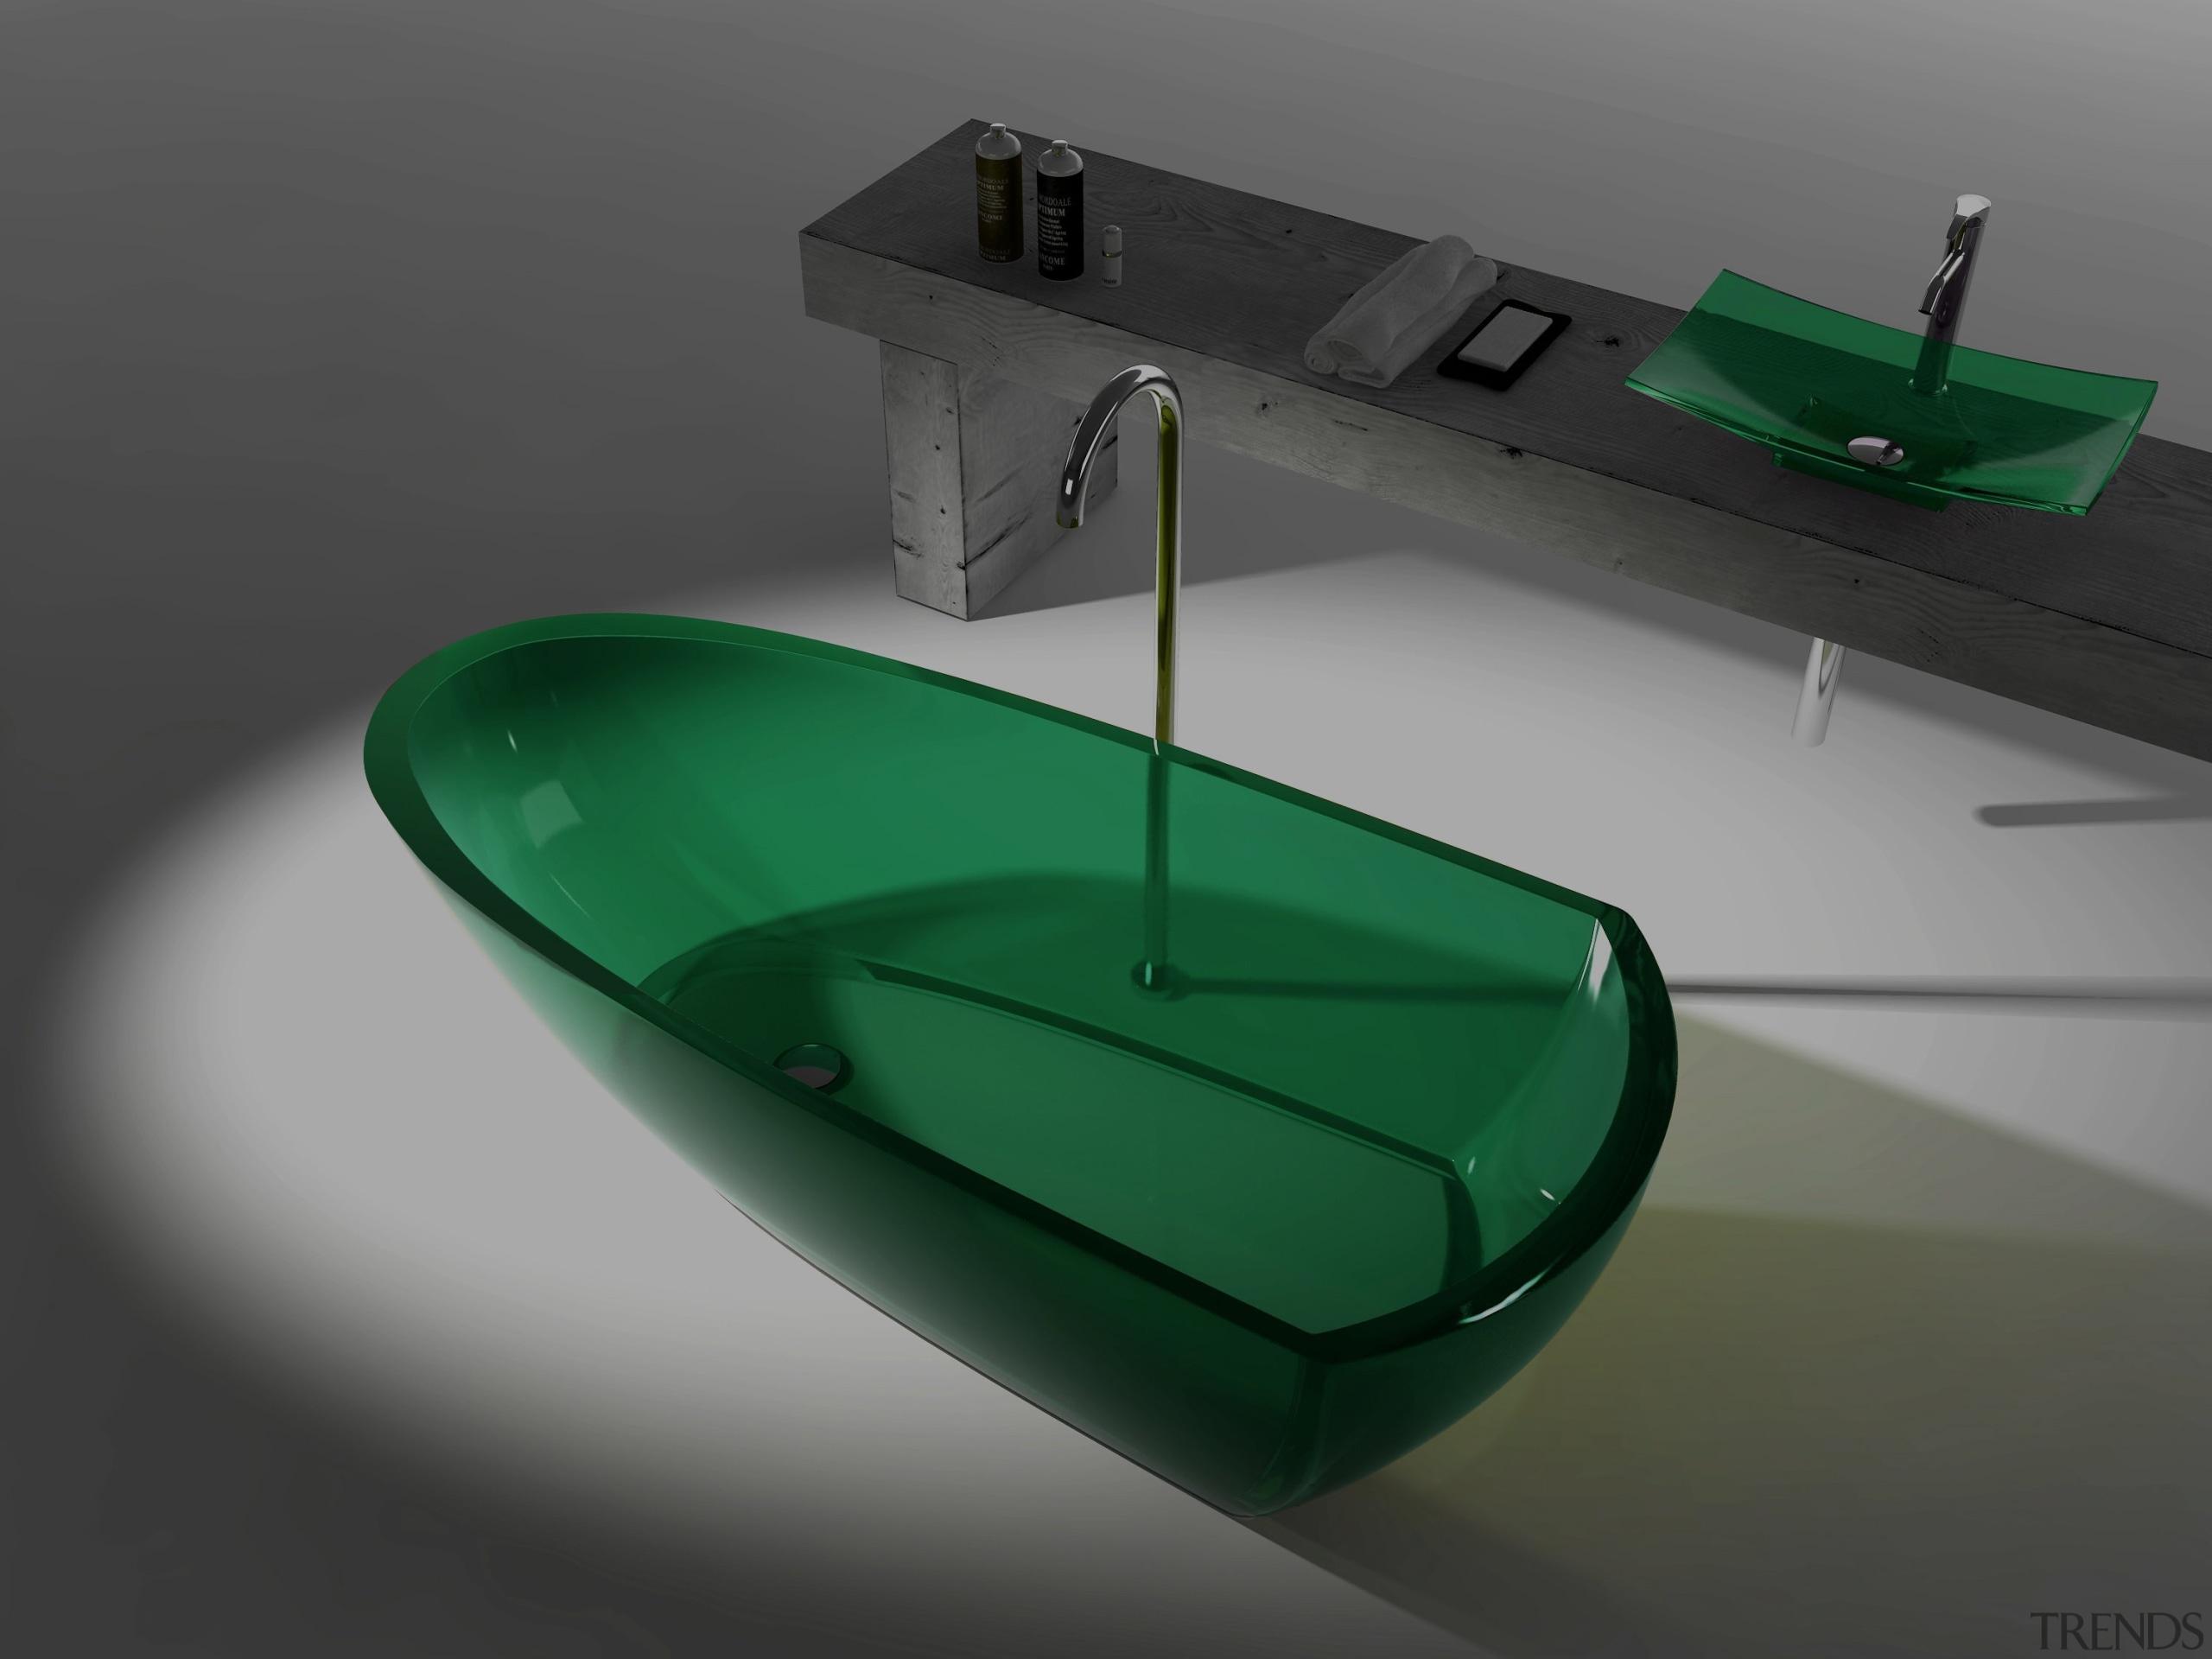 Colour Range Green - Colour Range Green - angle, bathroom sink, bathtub, glass, green, hardware, plumbing fixture, product, product design, sink, gray, black